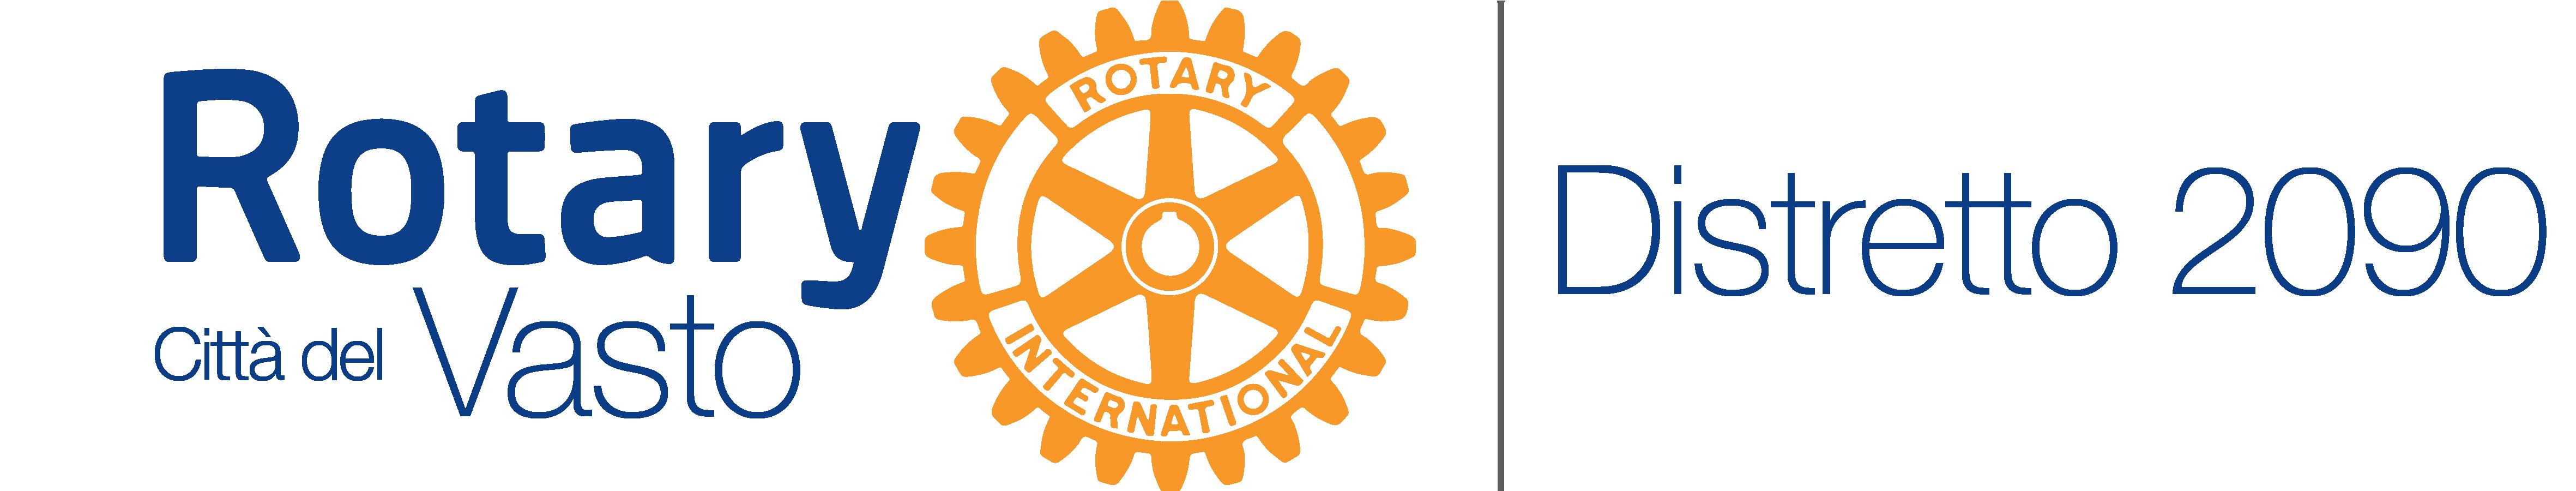 logo_rotary_Vasto-01